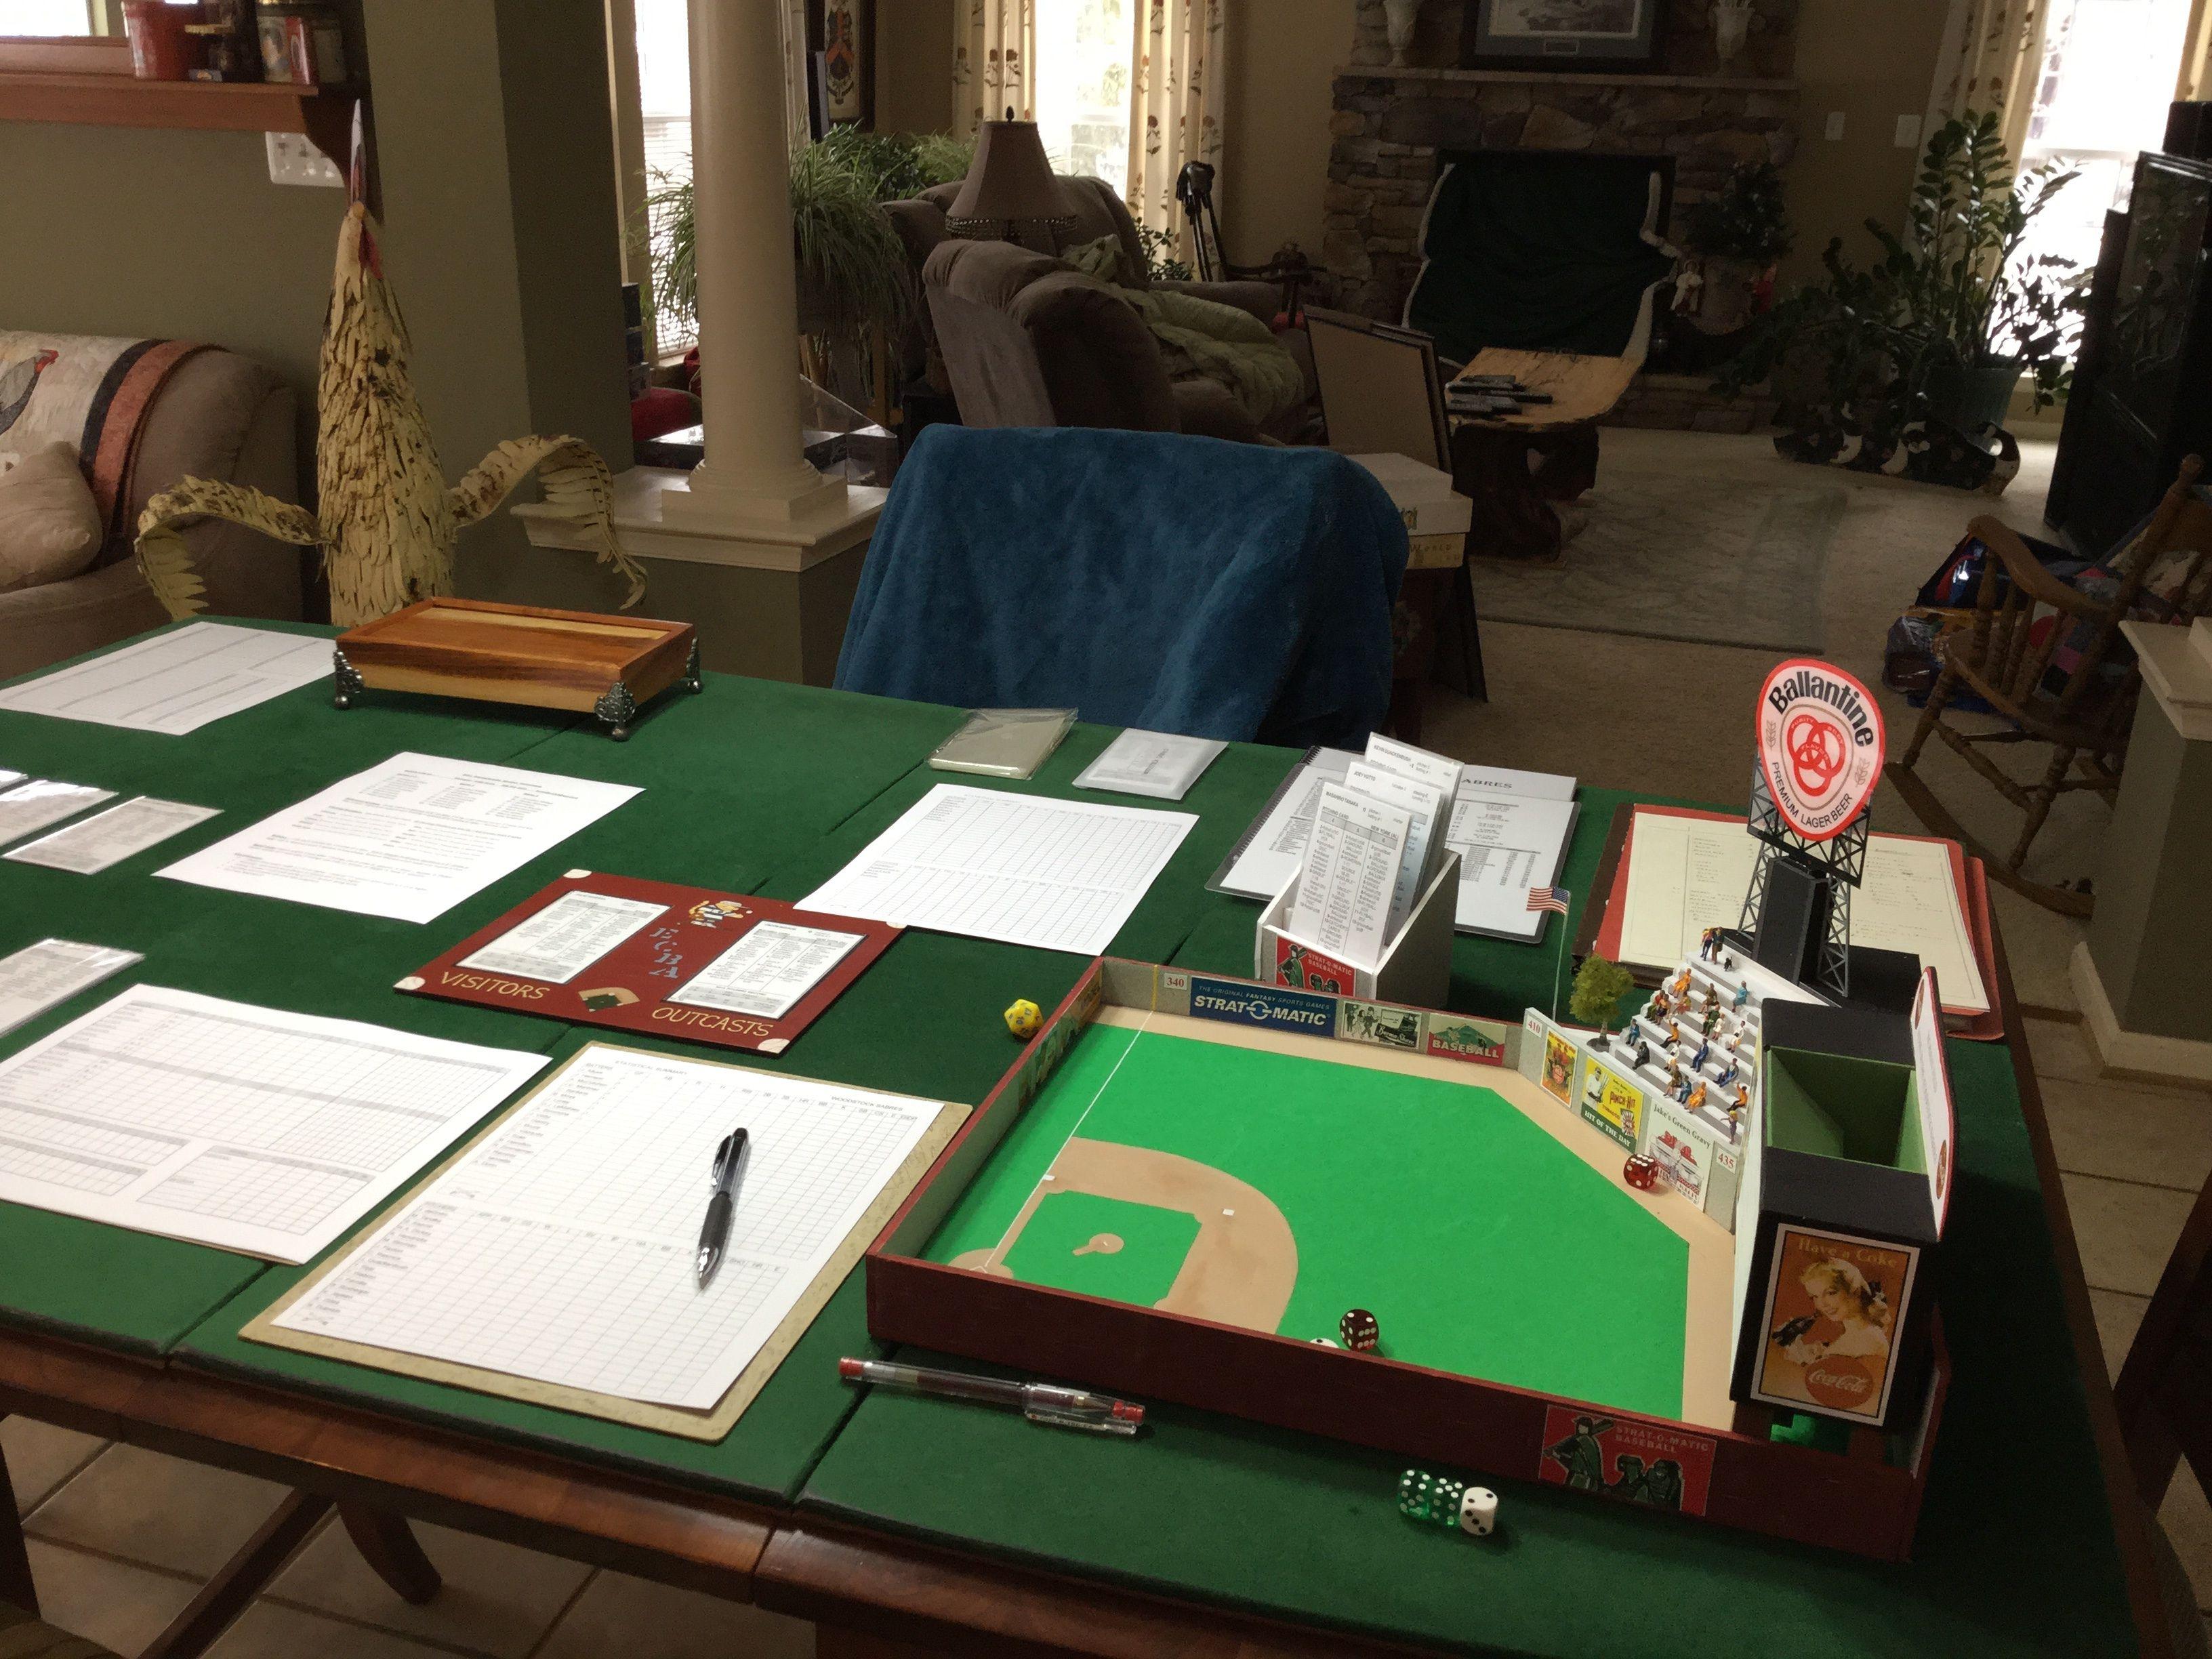 What a game setup stratomatic gaming setup poker table